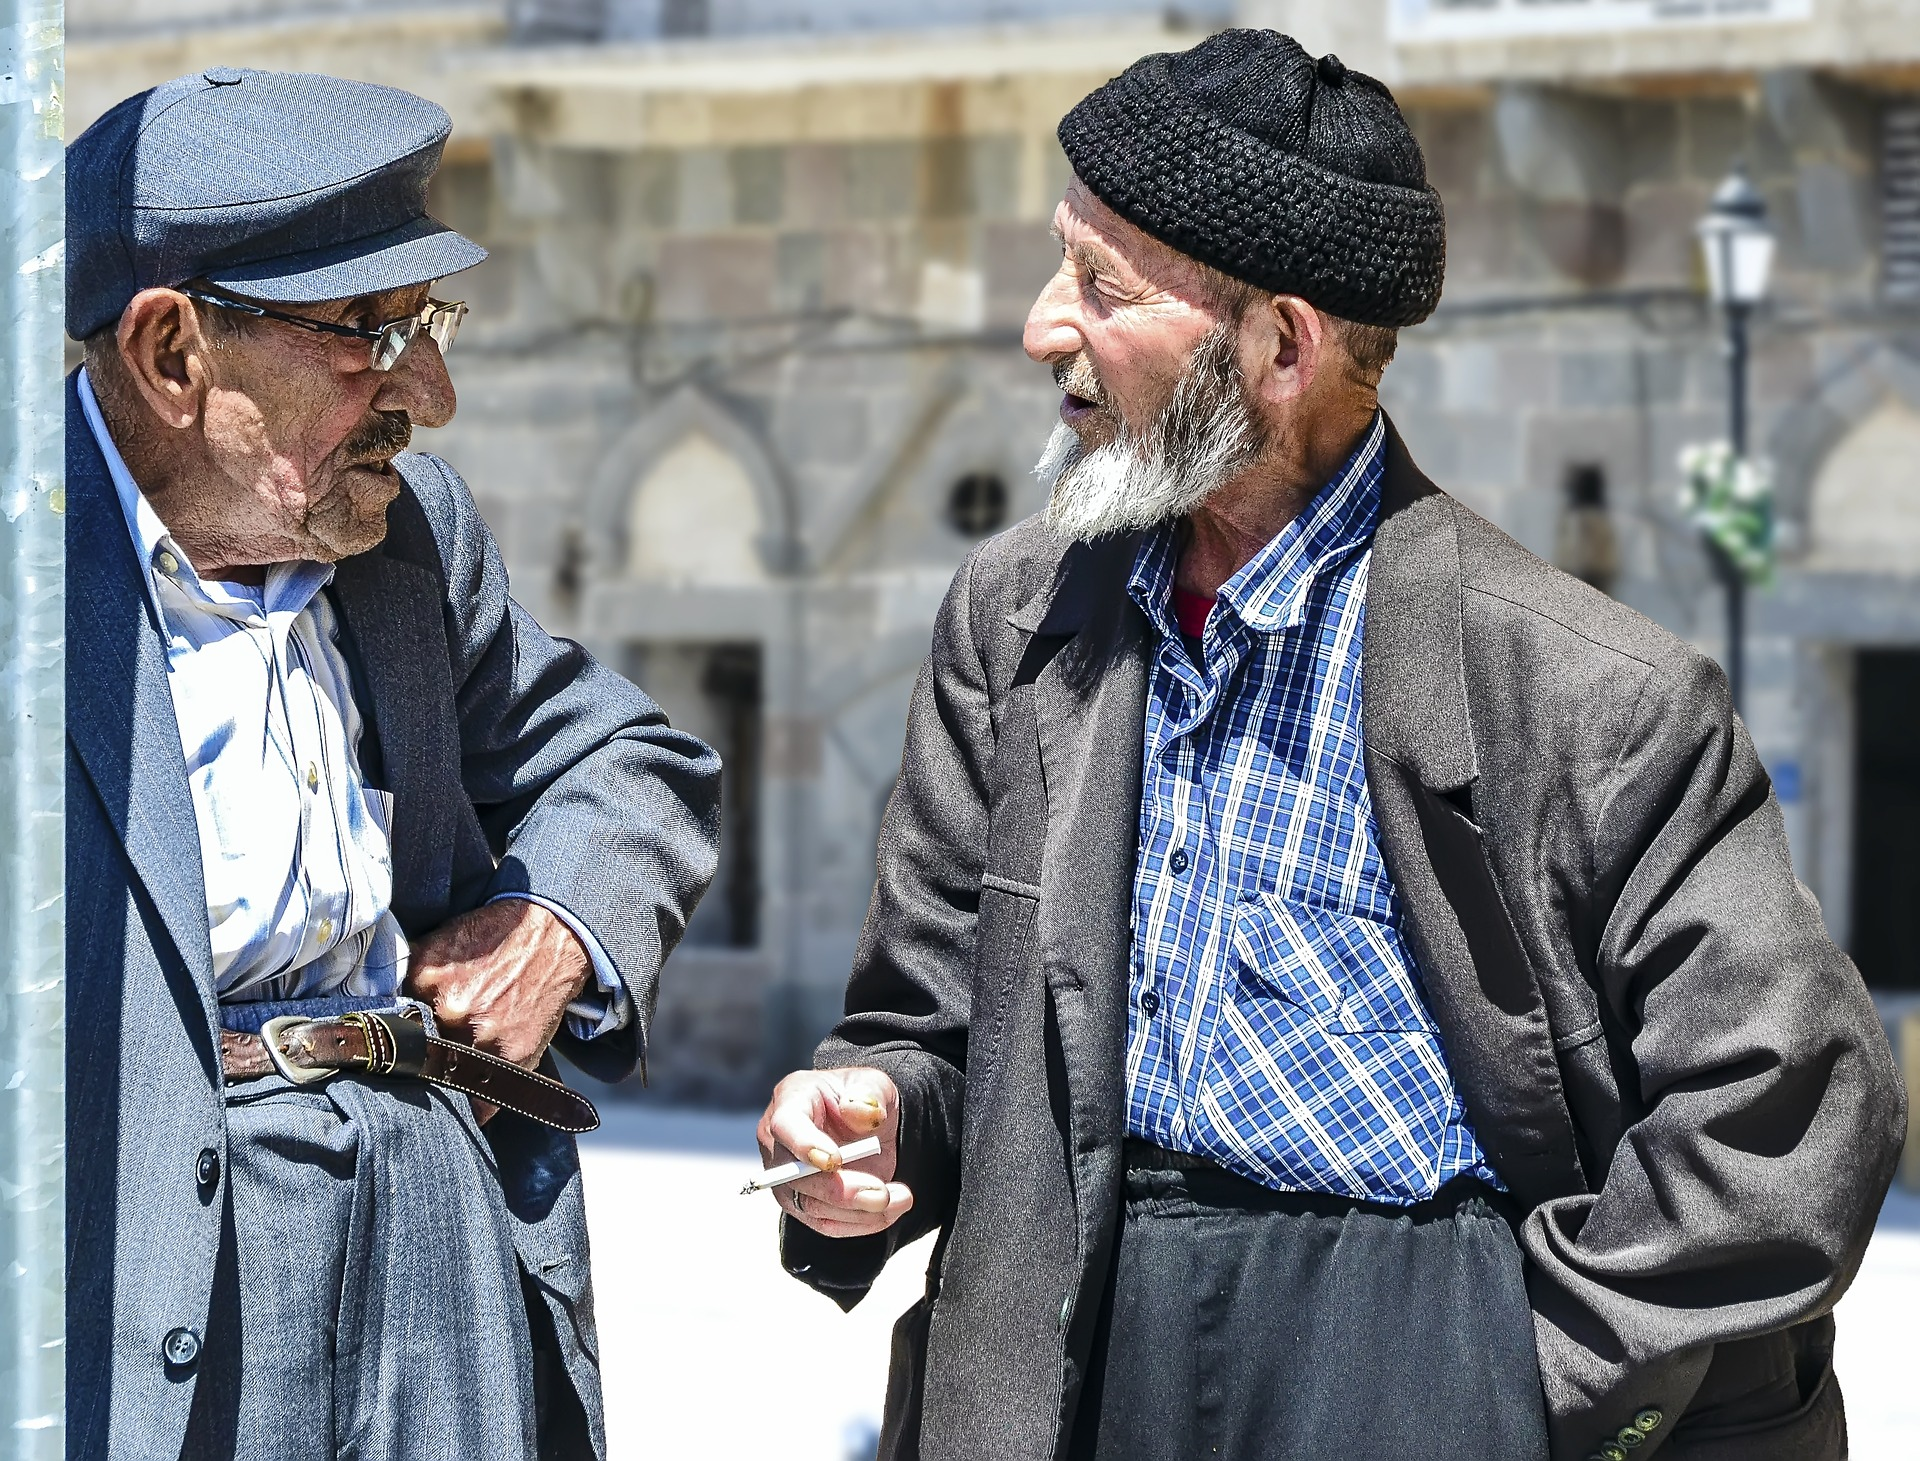 old-man-1739154_1920.jpg